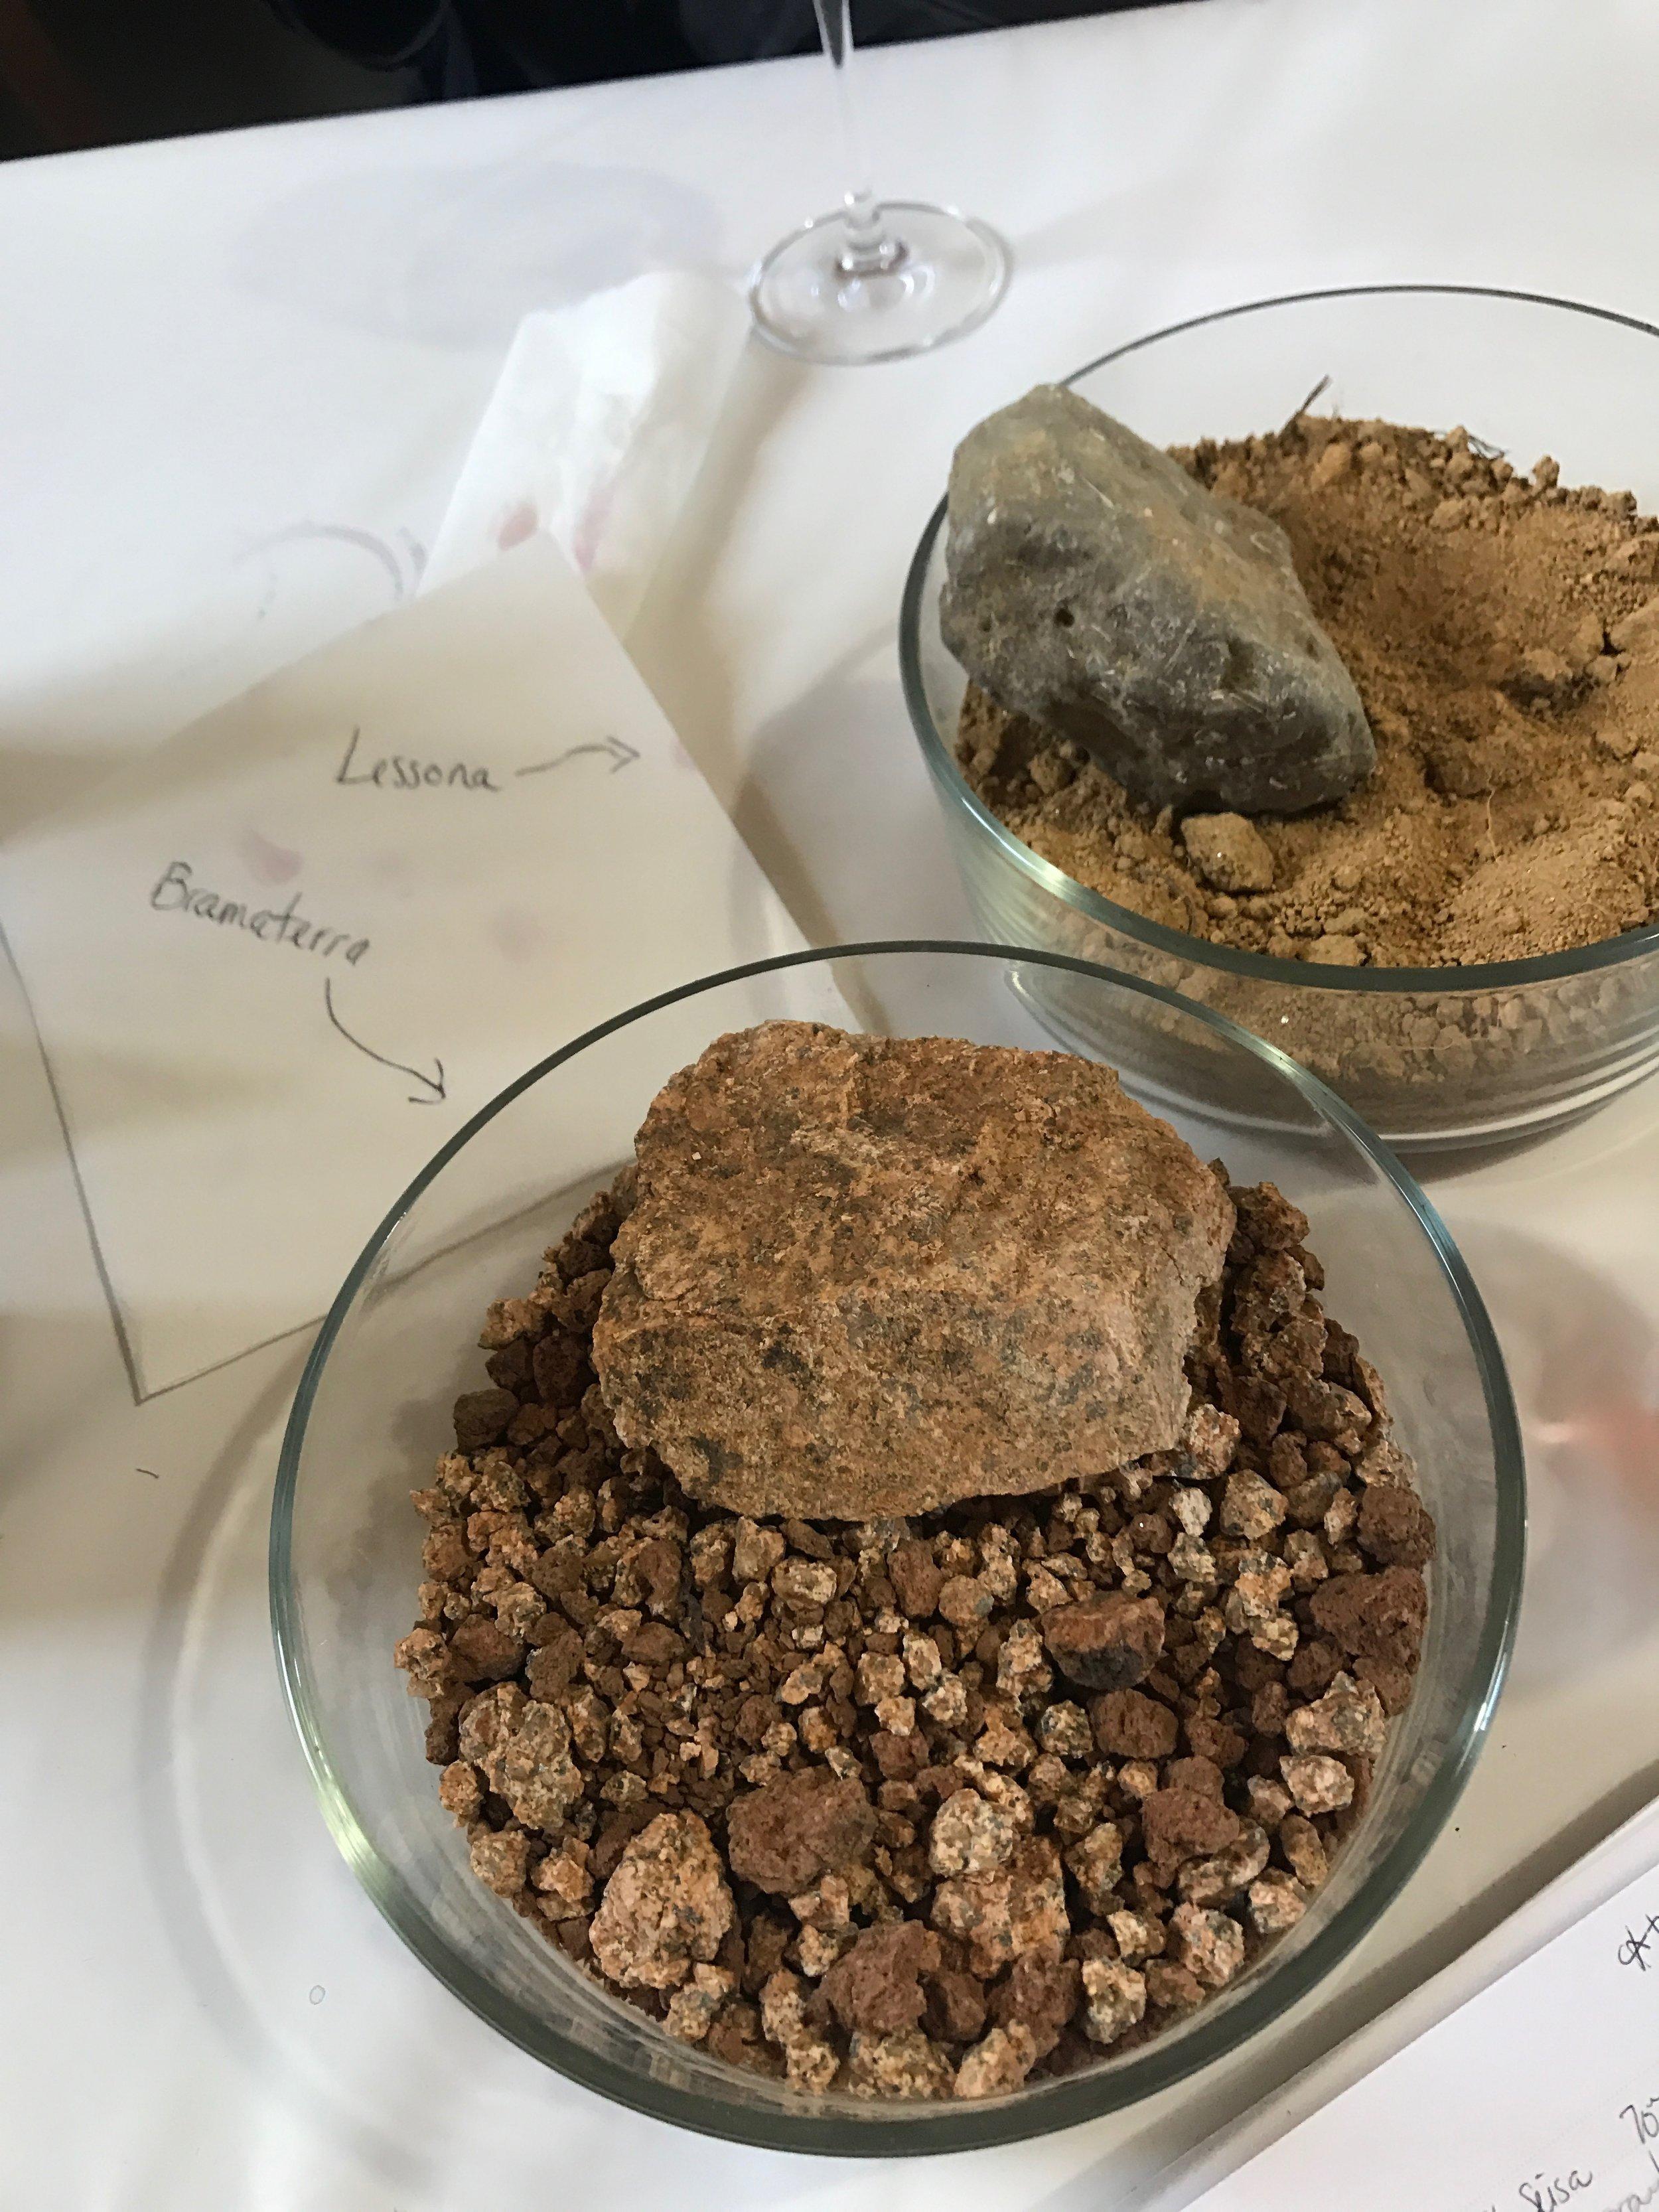 Colombera Garella - Lessona and Bramaterra soils.jpg